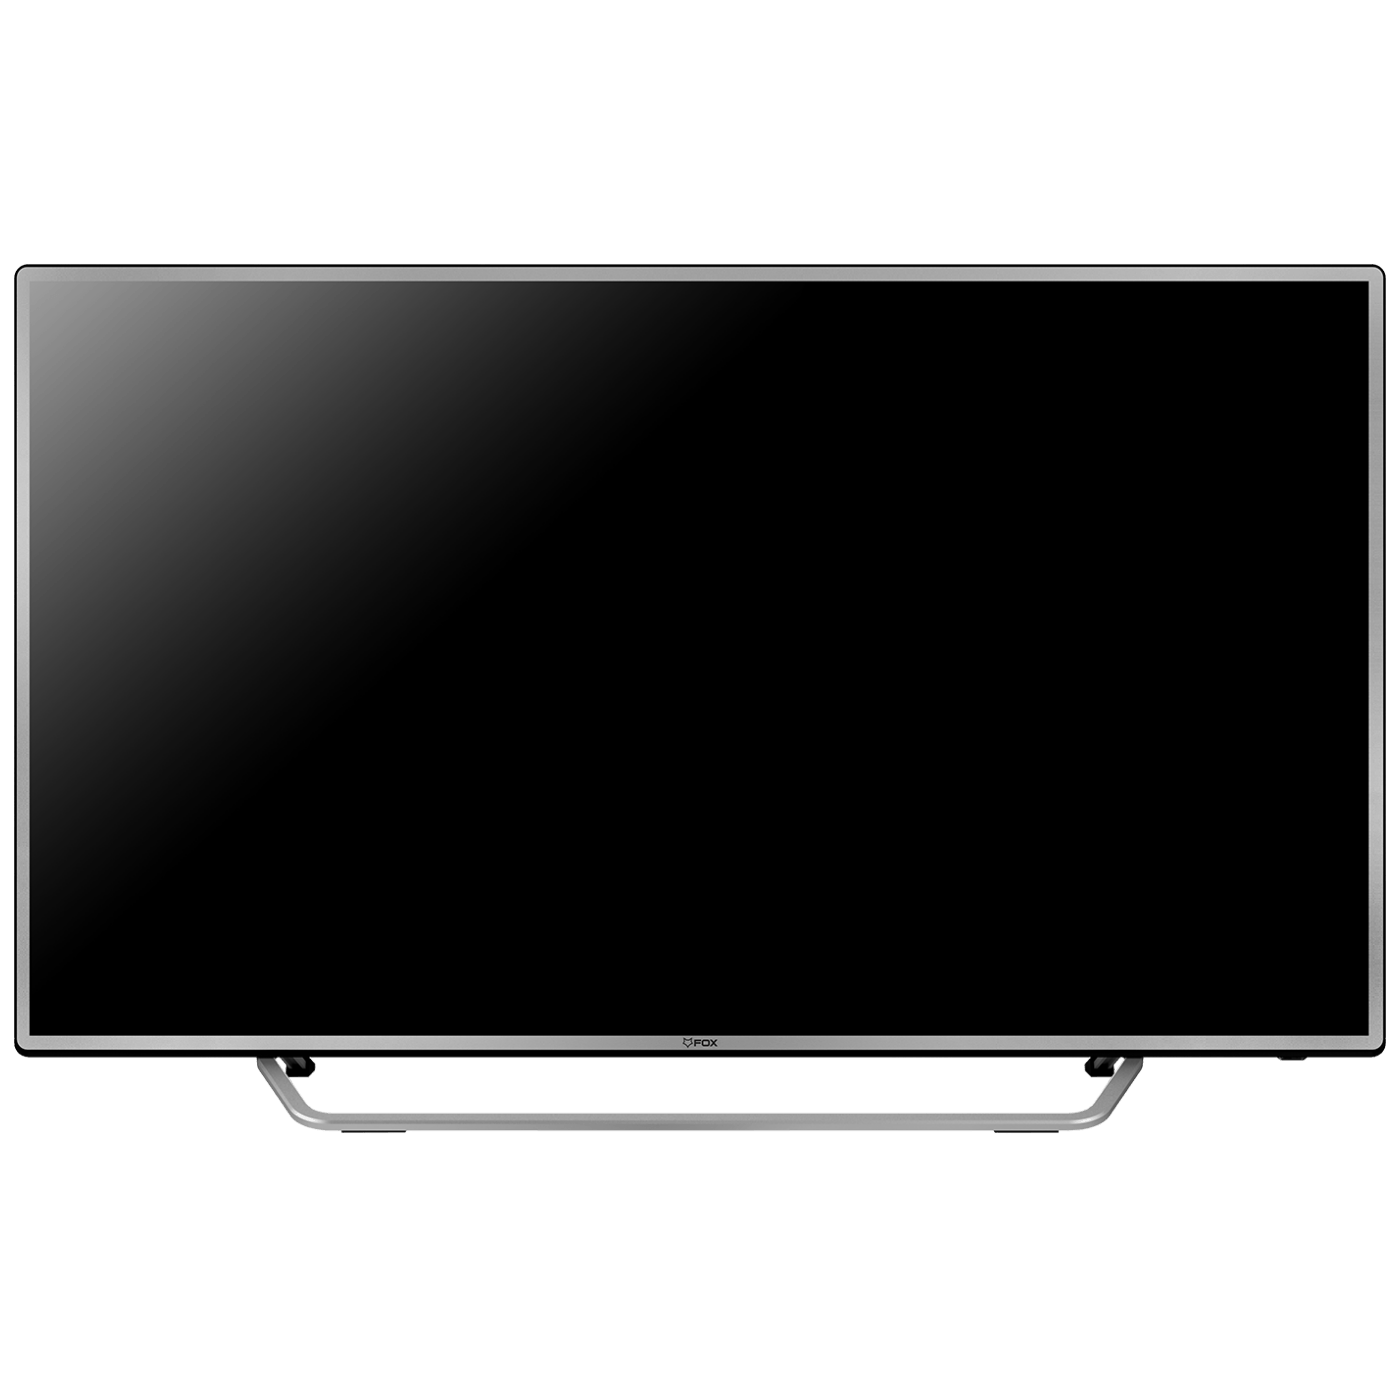 LED TV 50